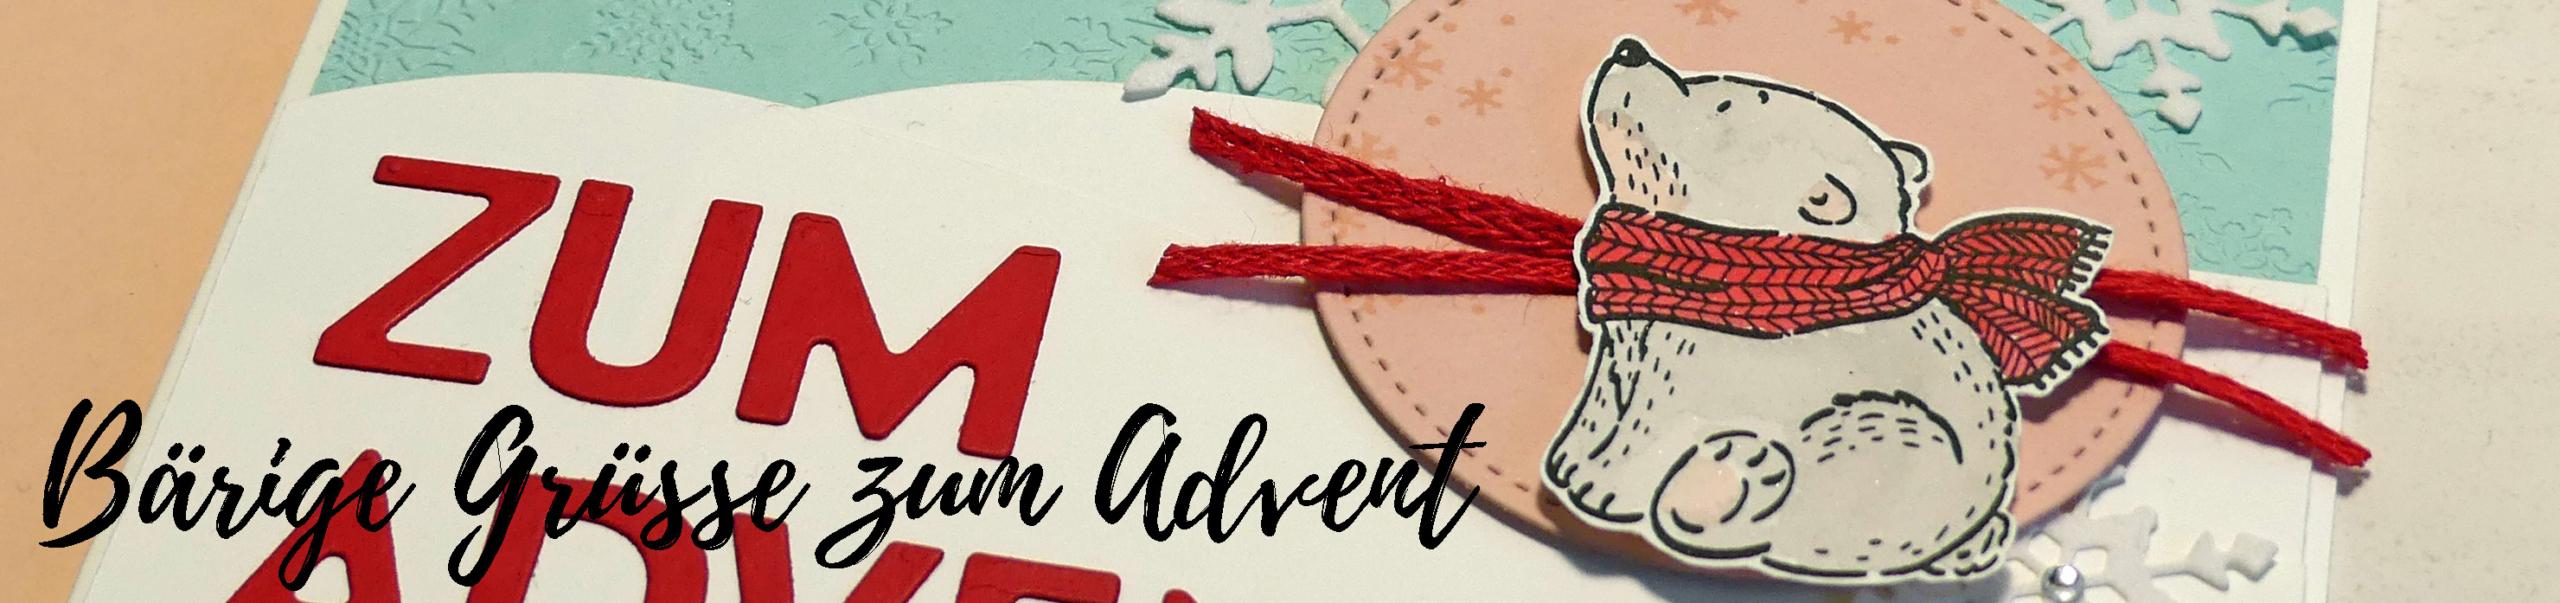 Bärige Grüße zum Advent